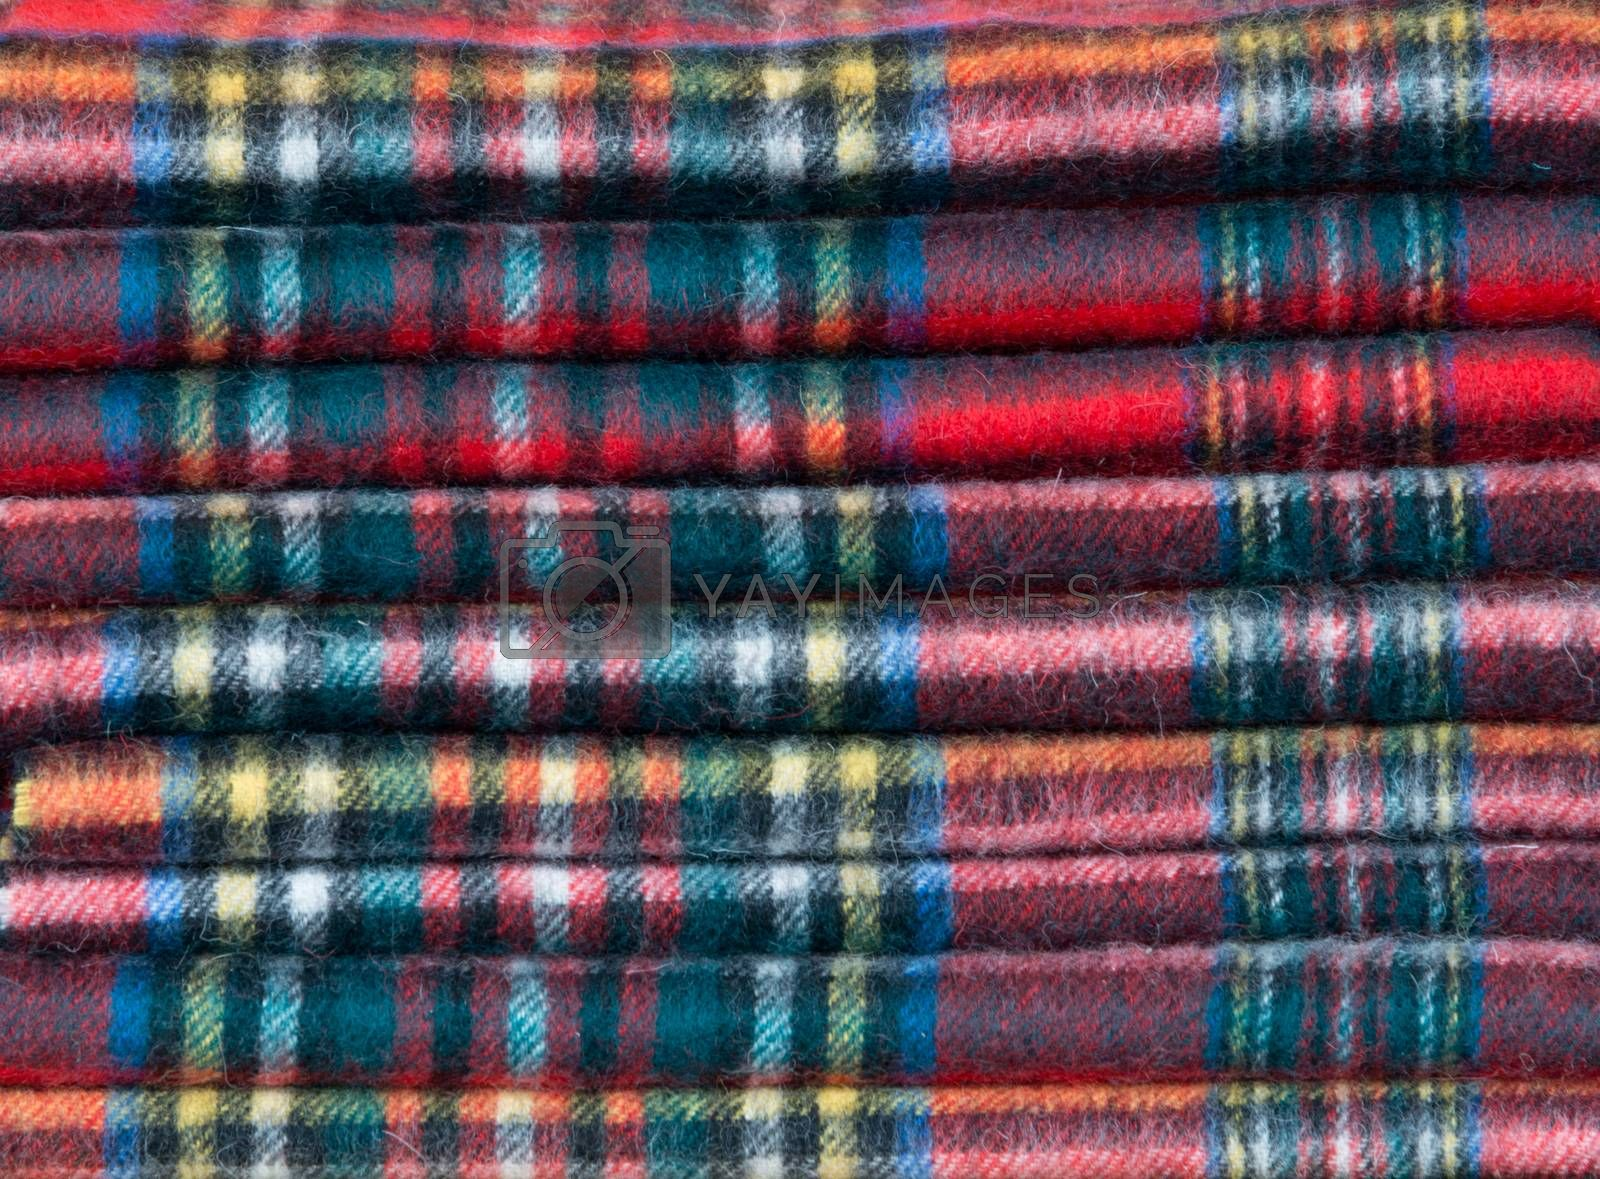 A pile of tartan scarves